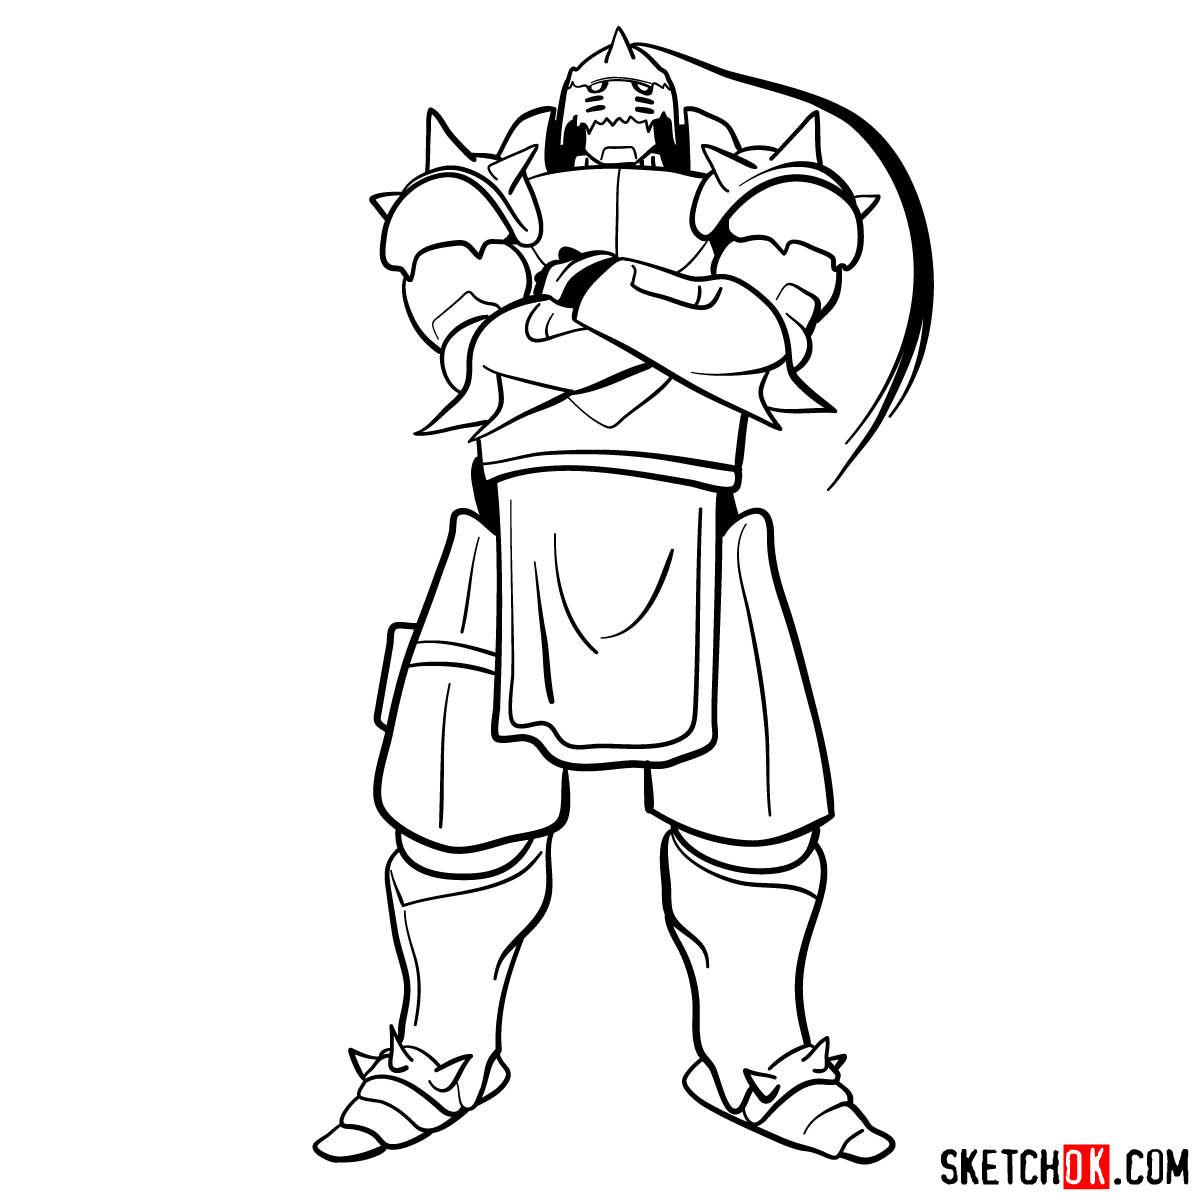 How to draw Alphonse Elric | Fullmetal Alchemist